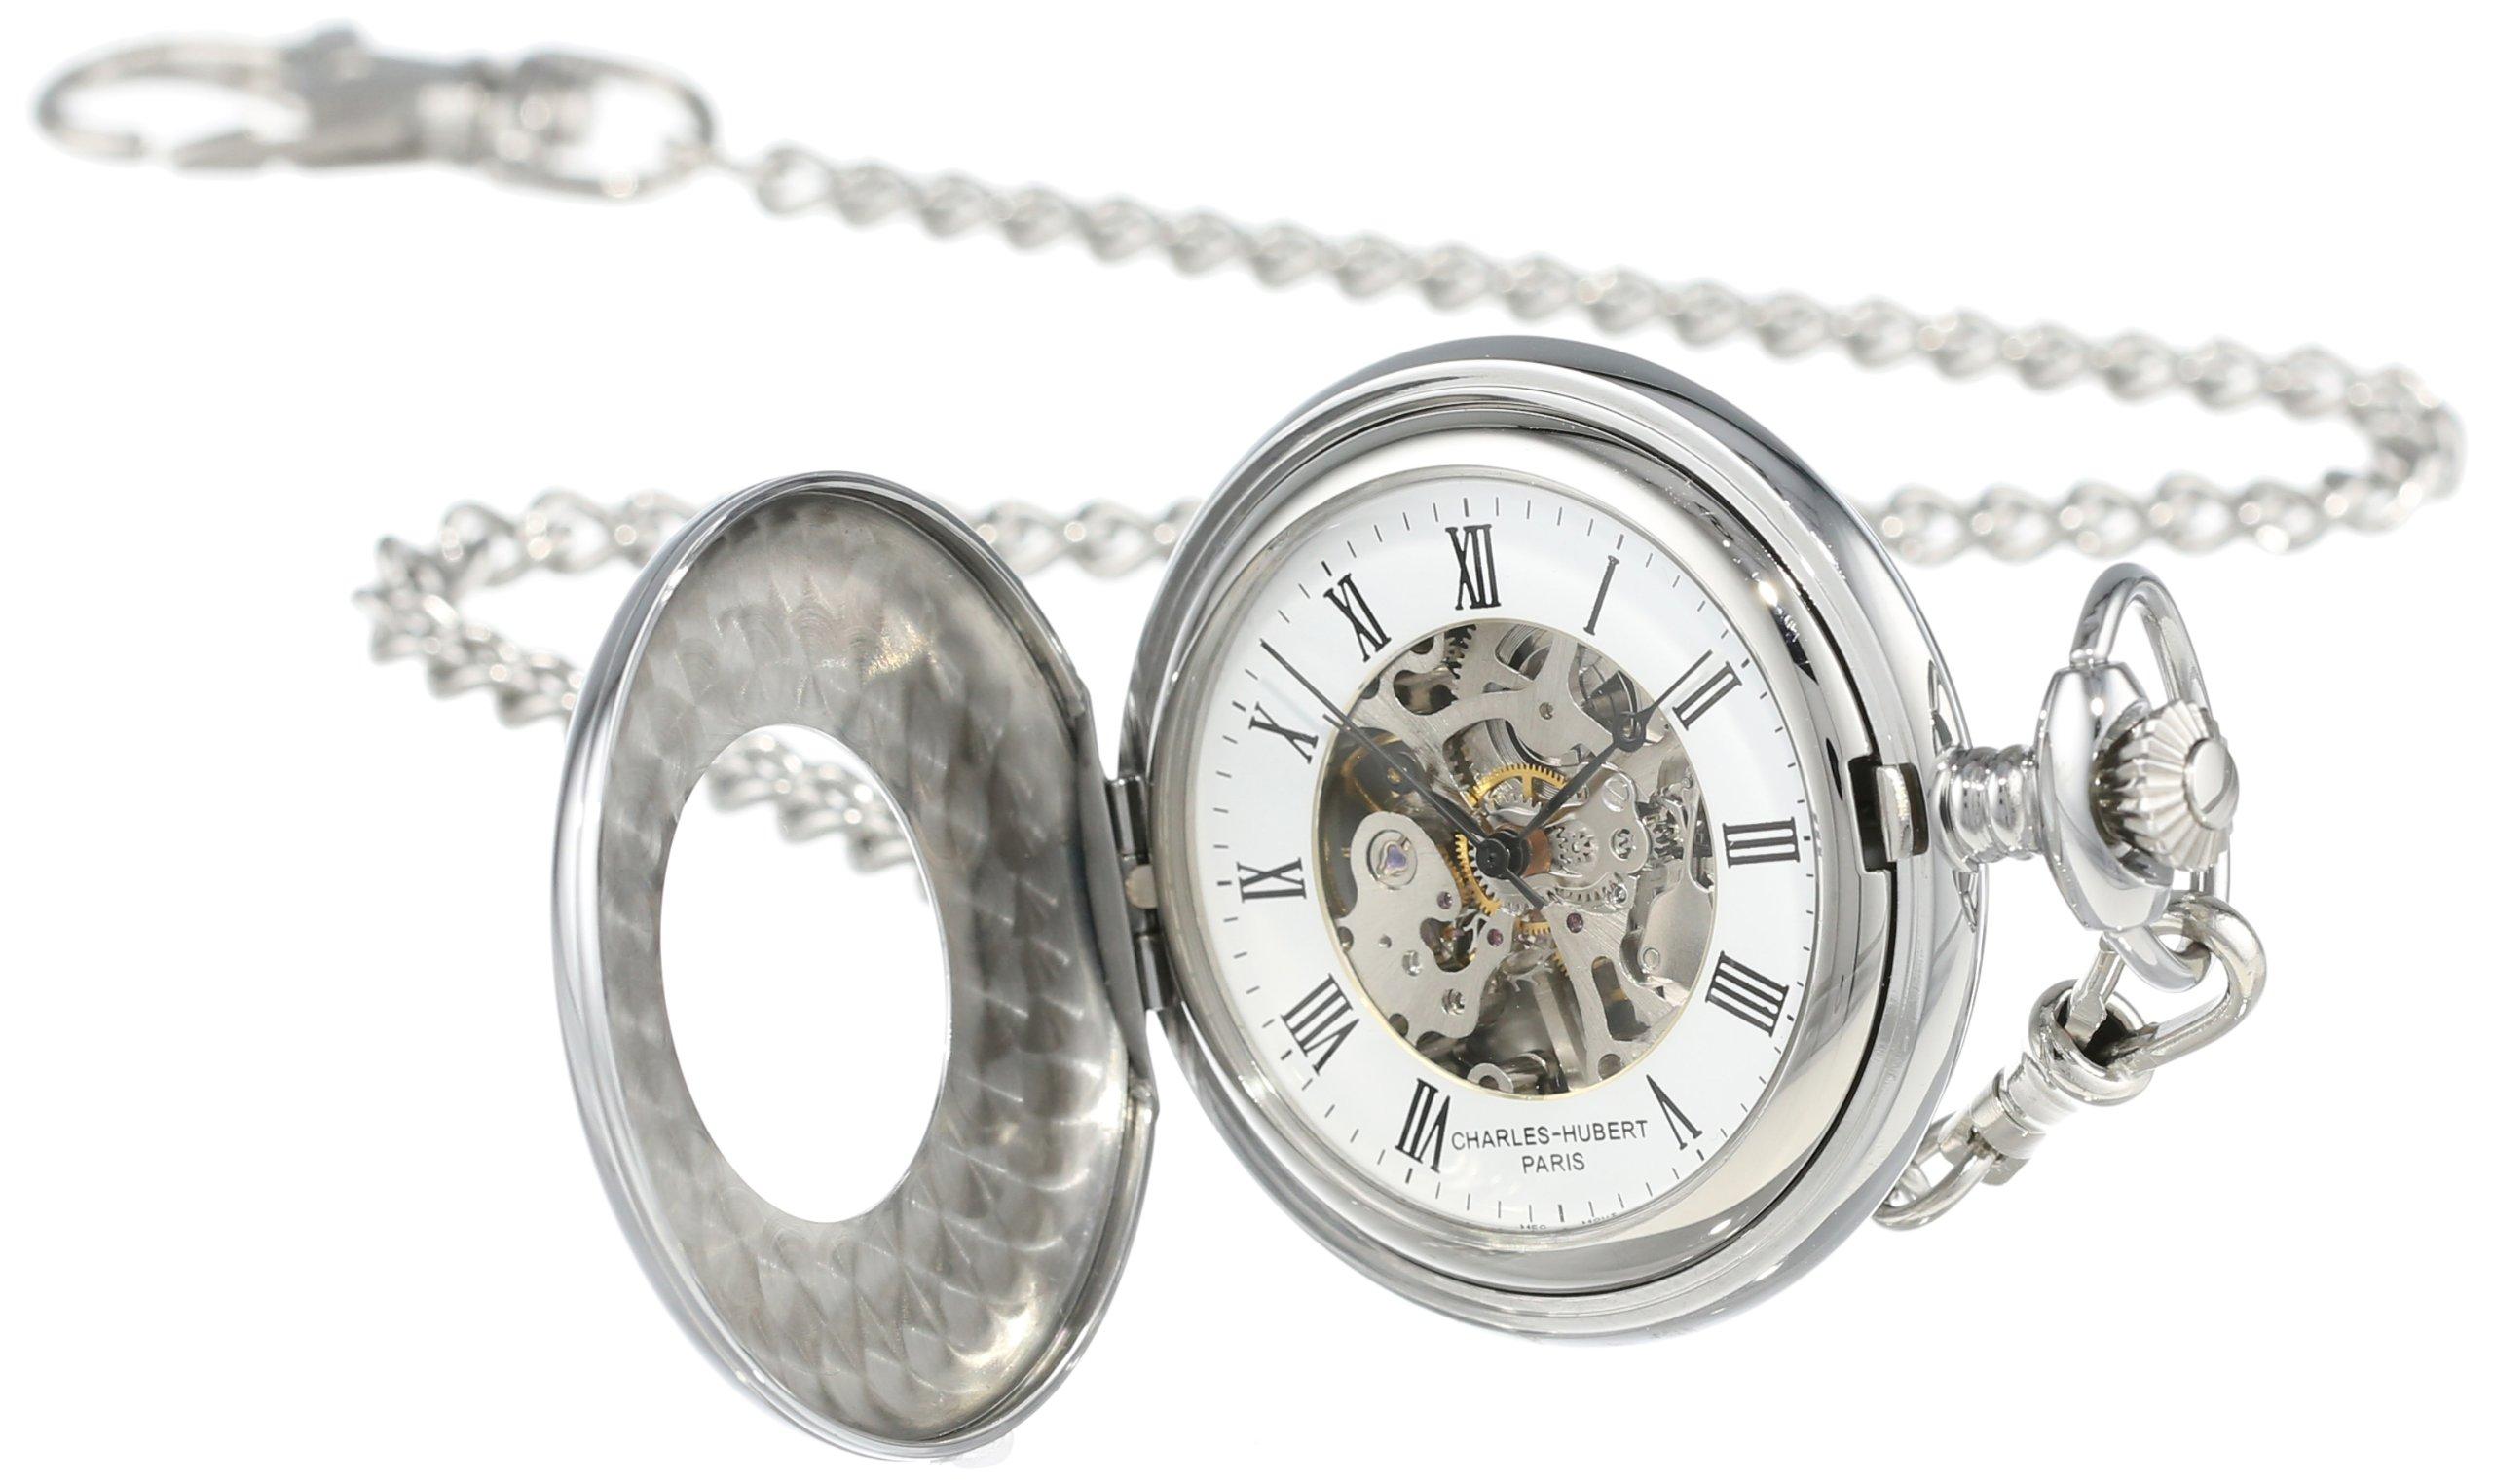 Charles-Hubert, Paris Stainless Steel Mechanical Pocket Watch by CHARLES-HUBERT PARIS